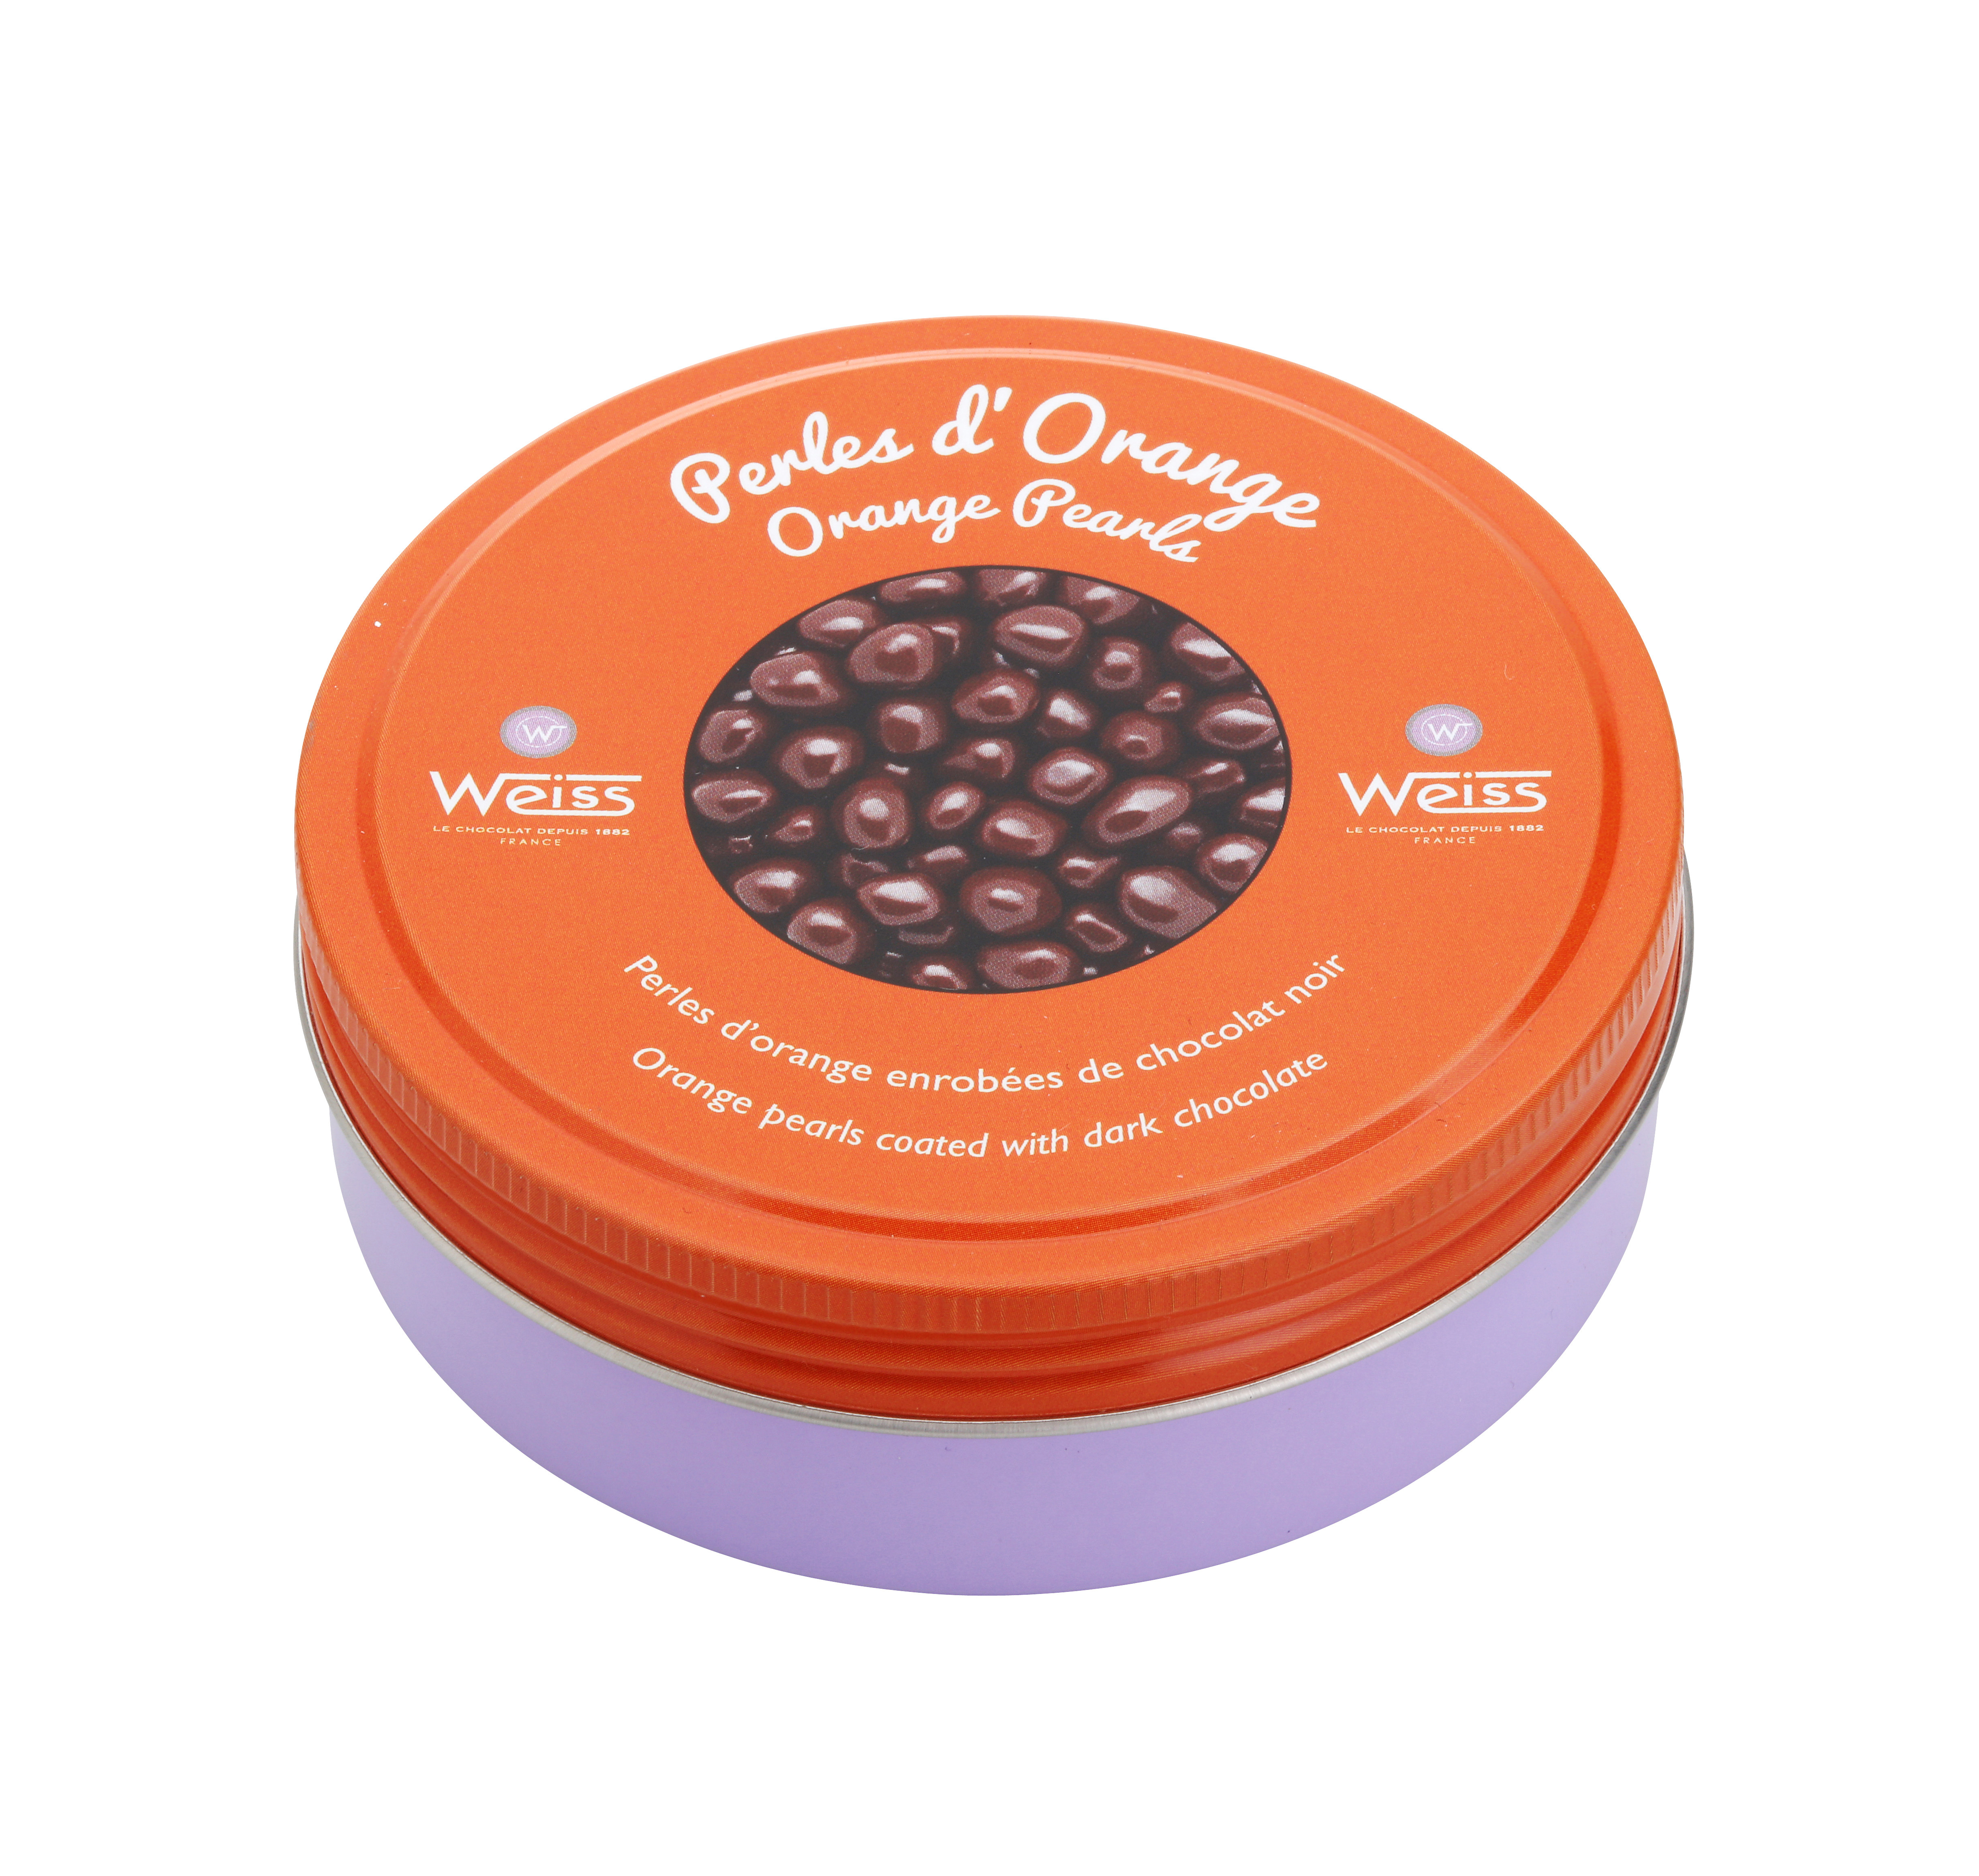 Perles d'orange au chocolat noir, Weiss (75 g)